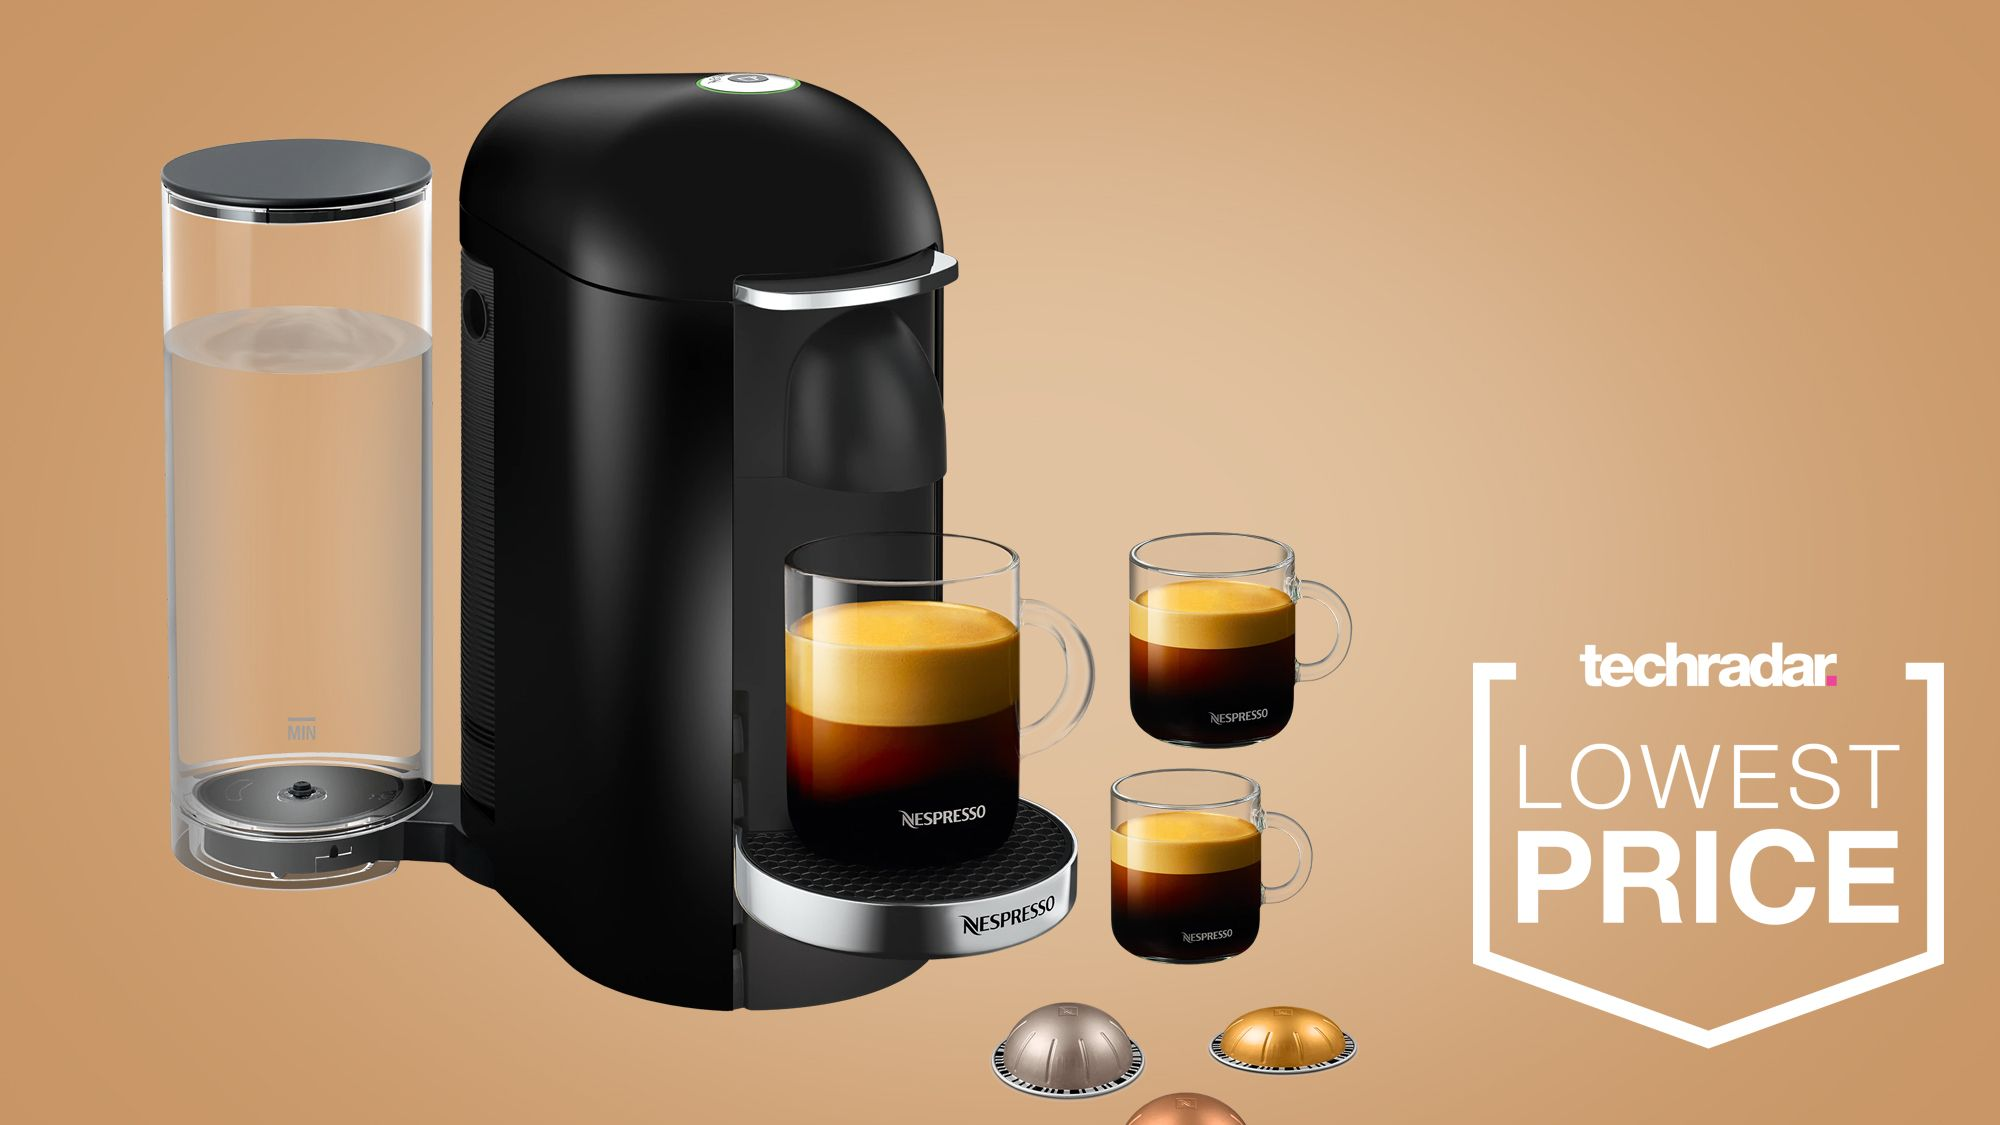 Currys' halfprice Nespresso VertuoPlus coffee machine